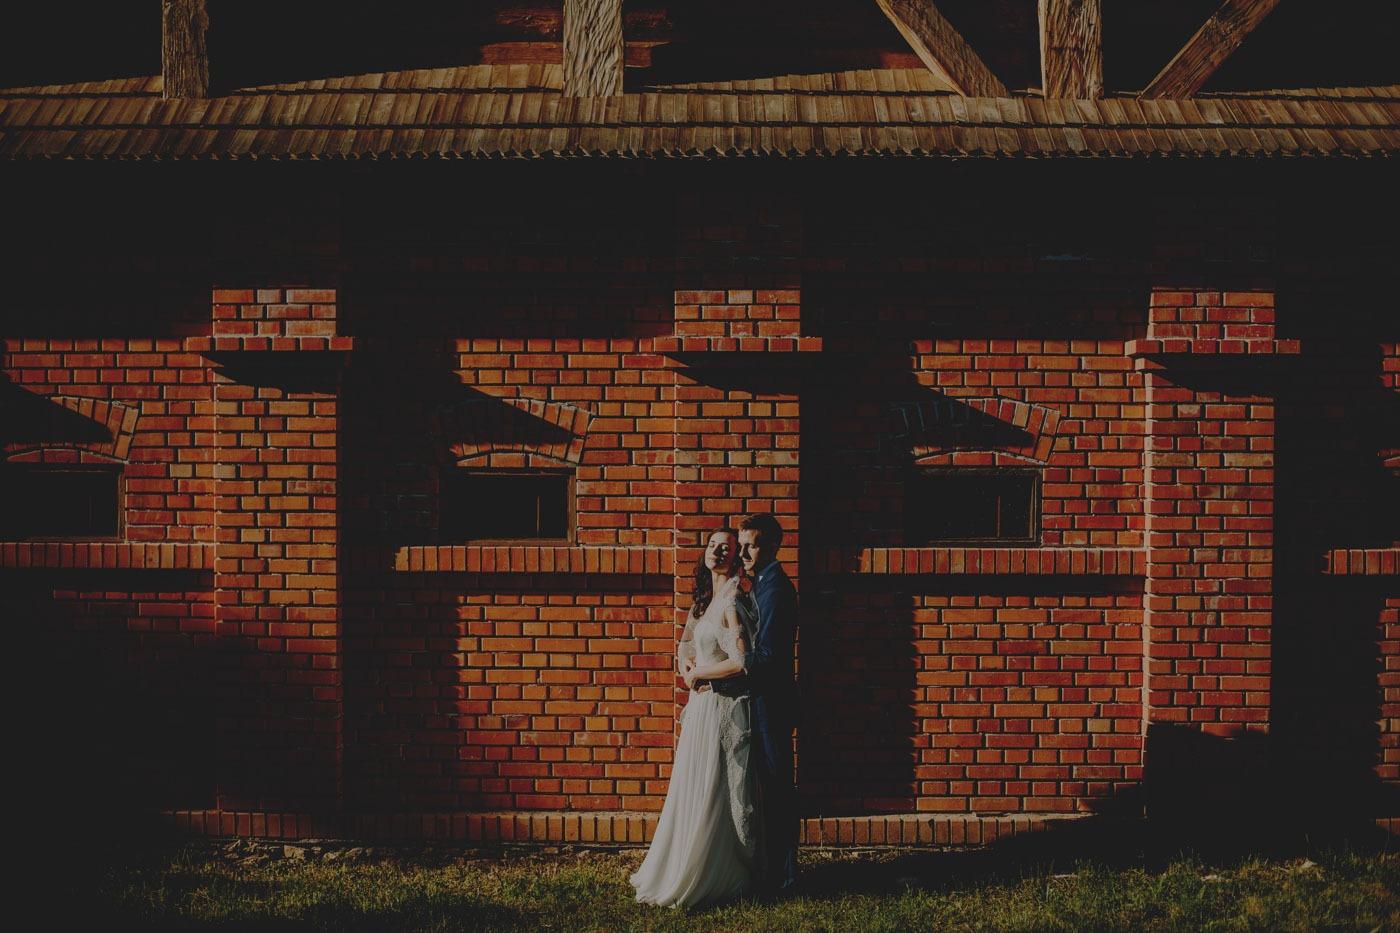 sesja ślubna tokarnia